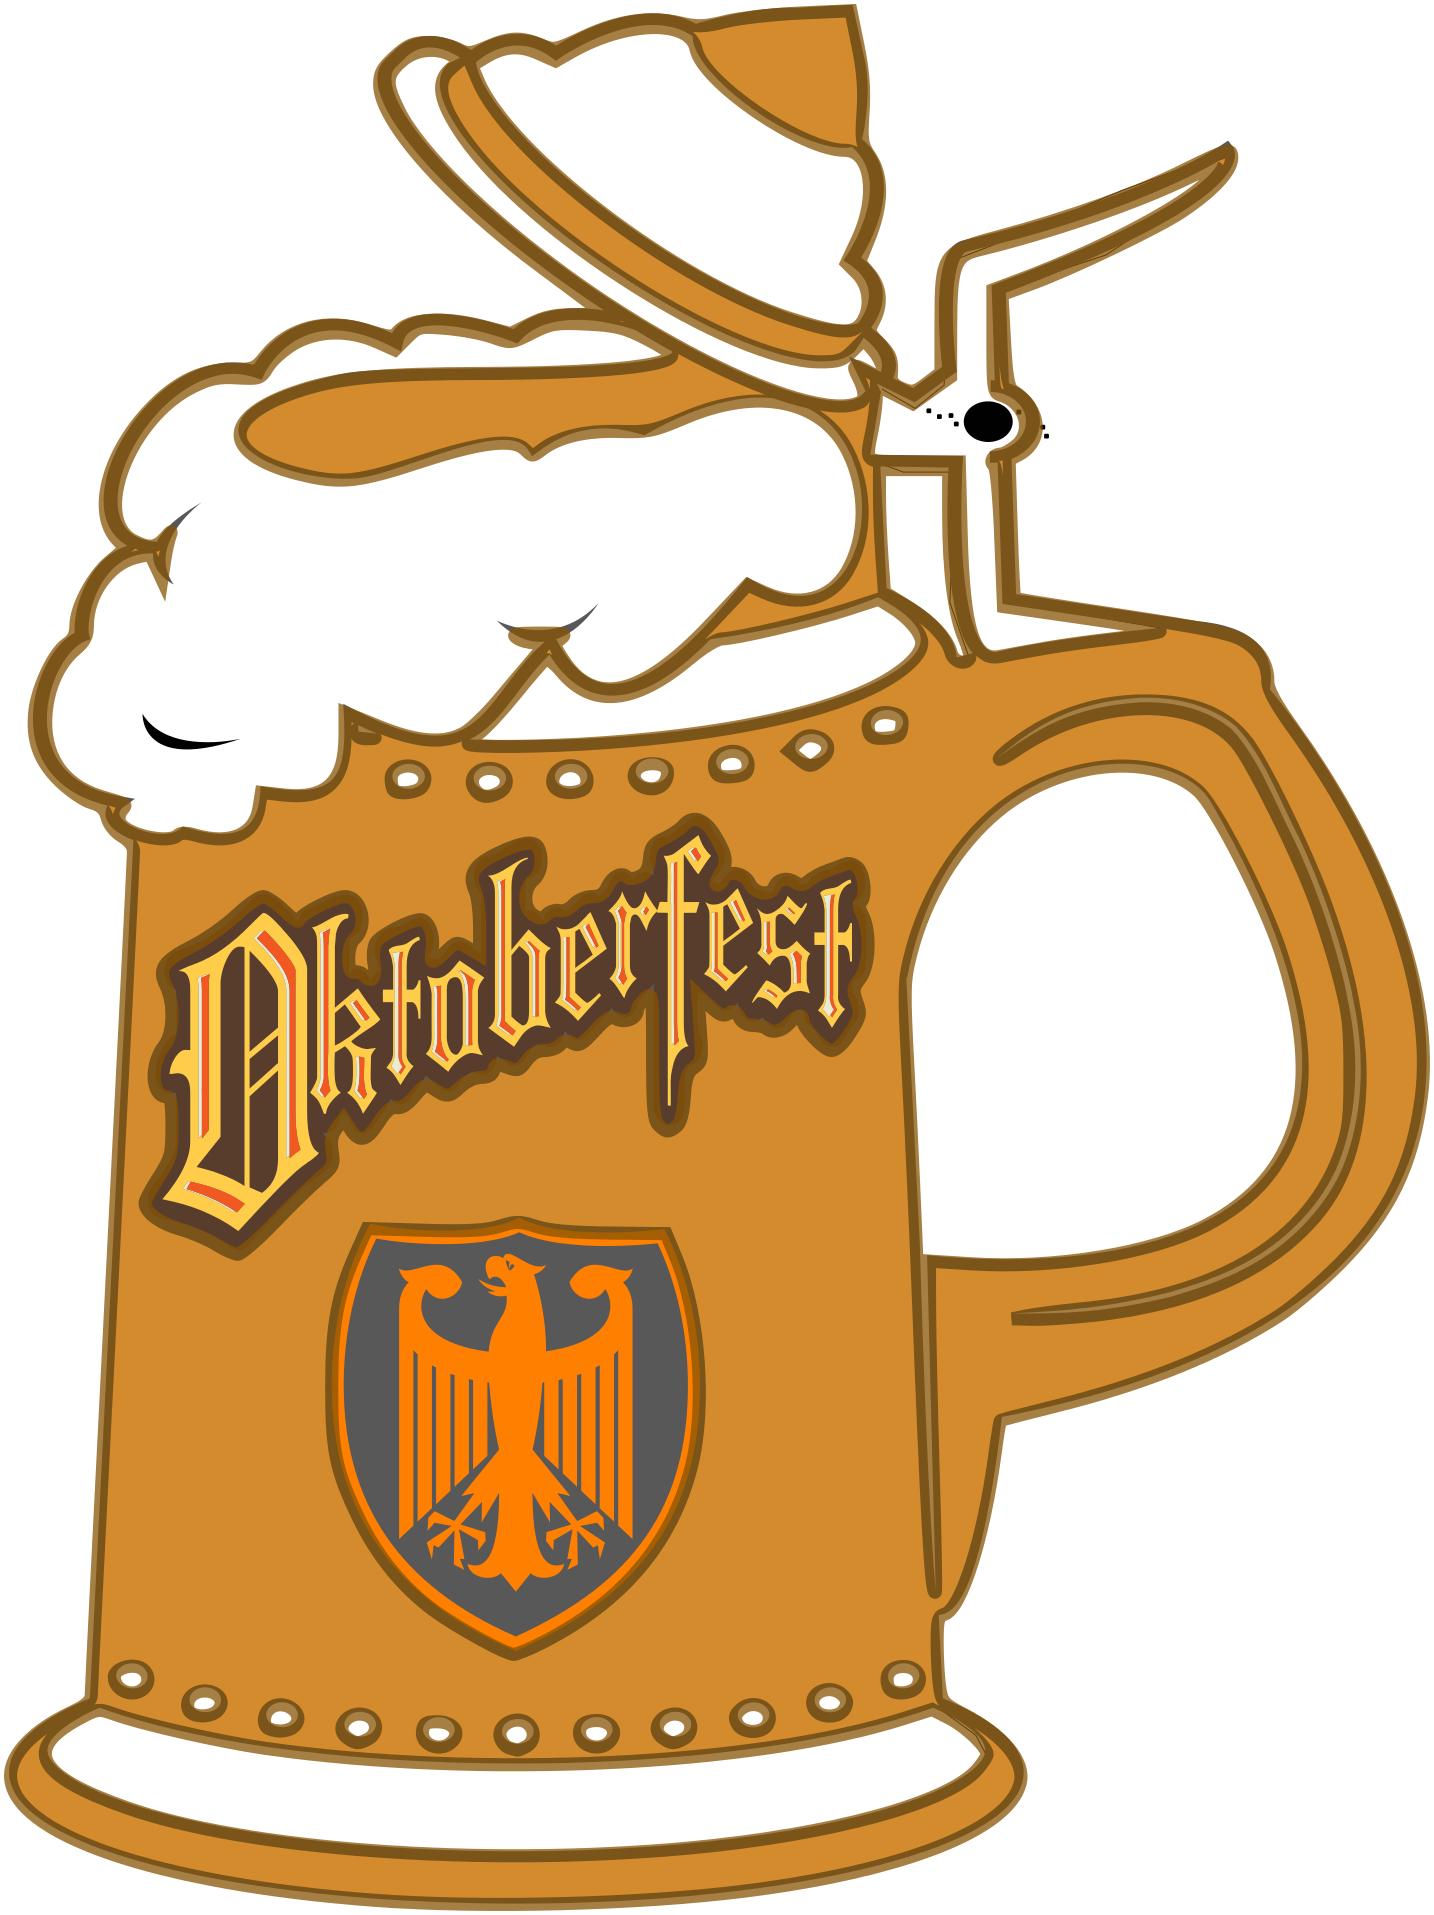 Oktoberfest Beer Beer octoberfest stein